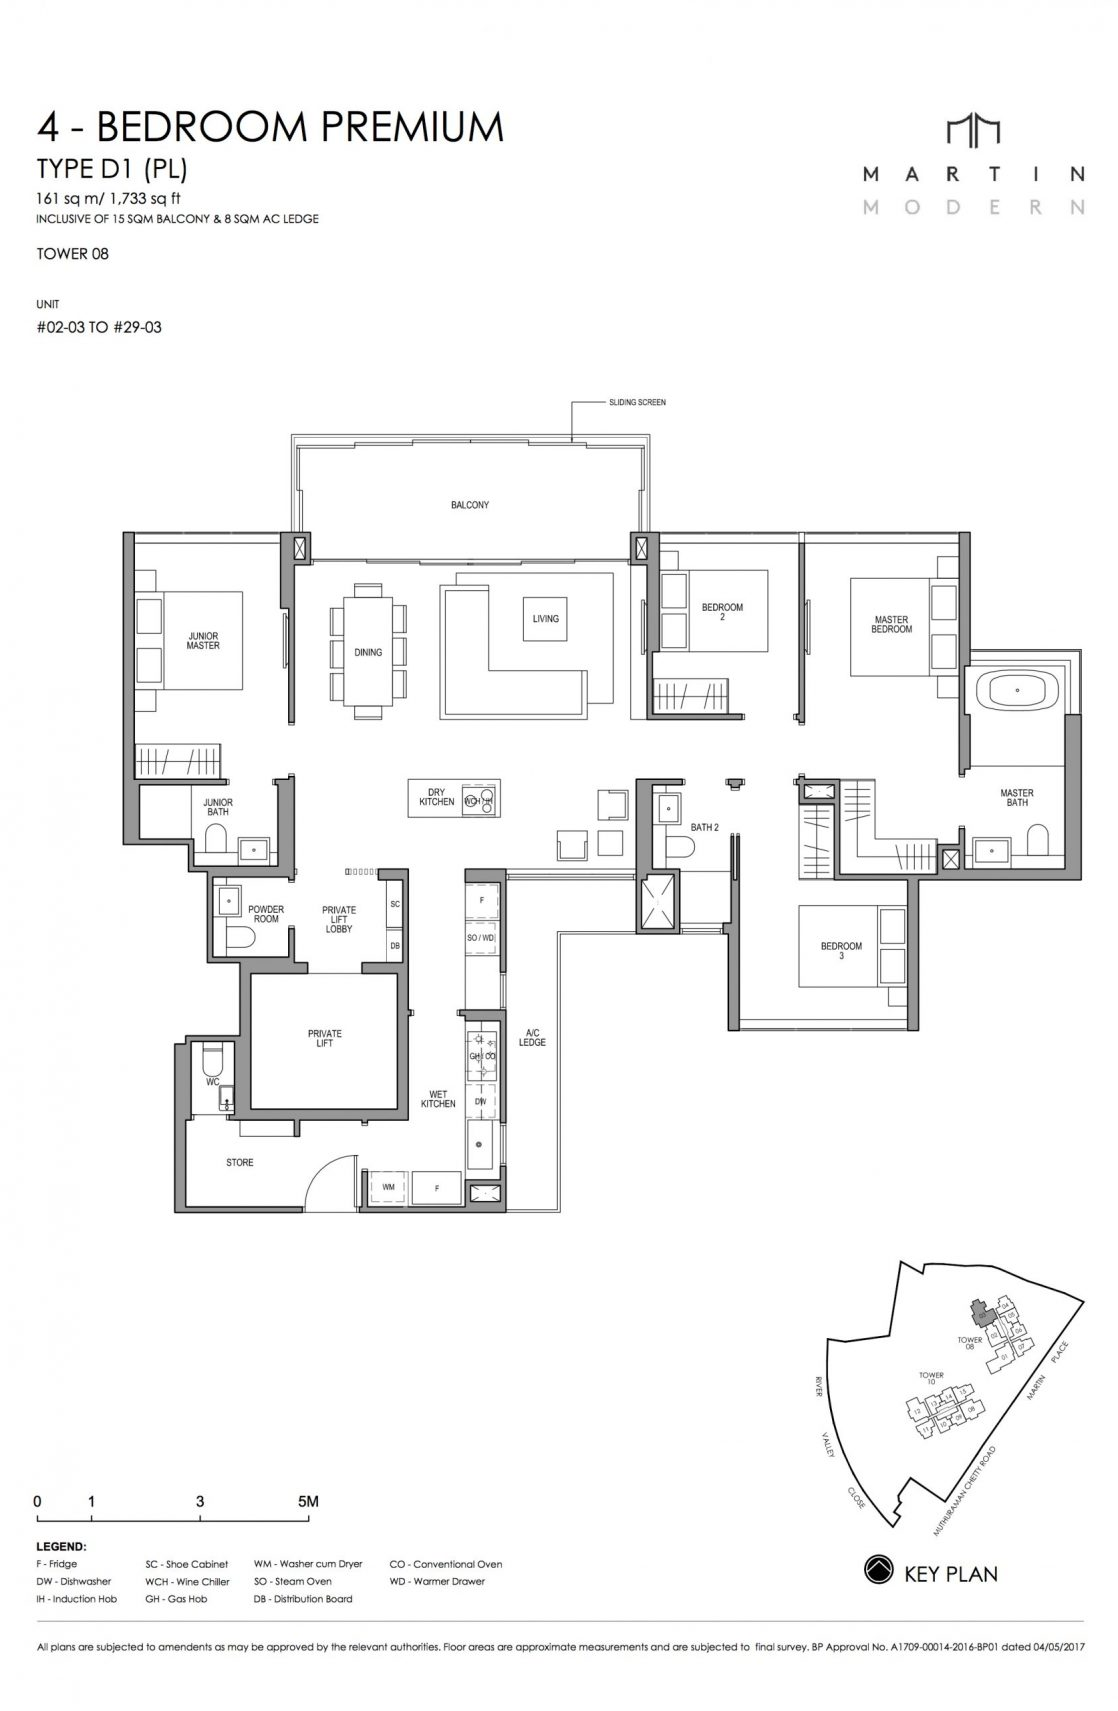 MARTIN MODERN 4-Bedroom TYPE D1PL